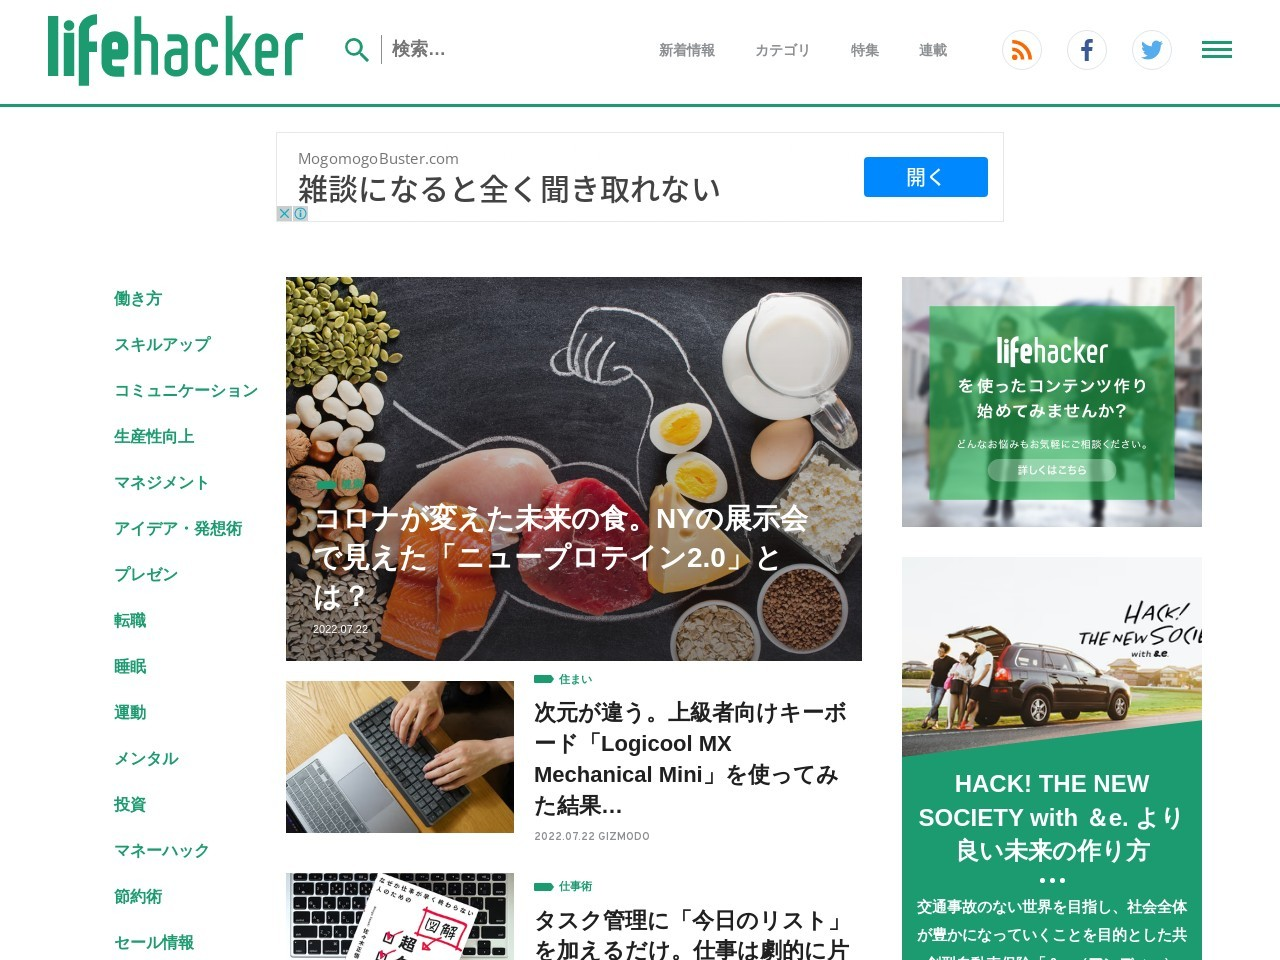 http://www.lifehacker.jp/2010/10/101029firefox_4.html